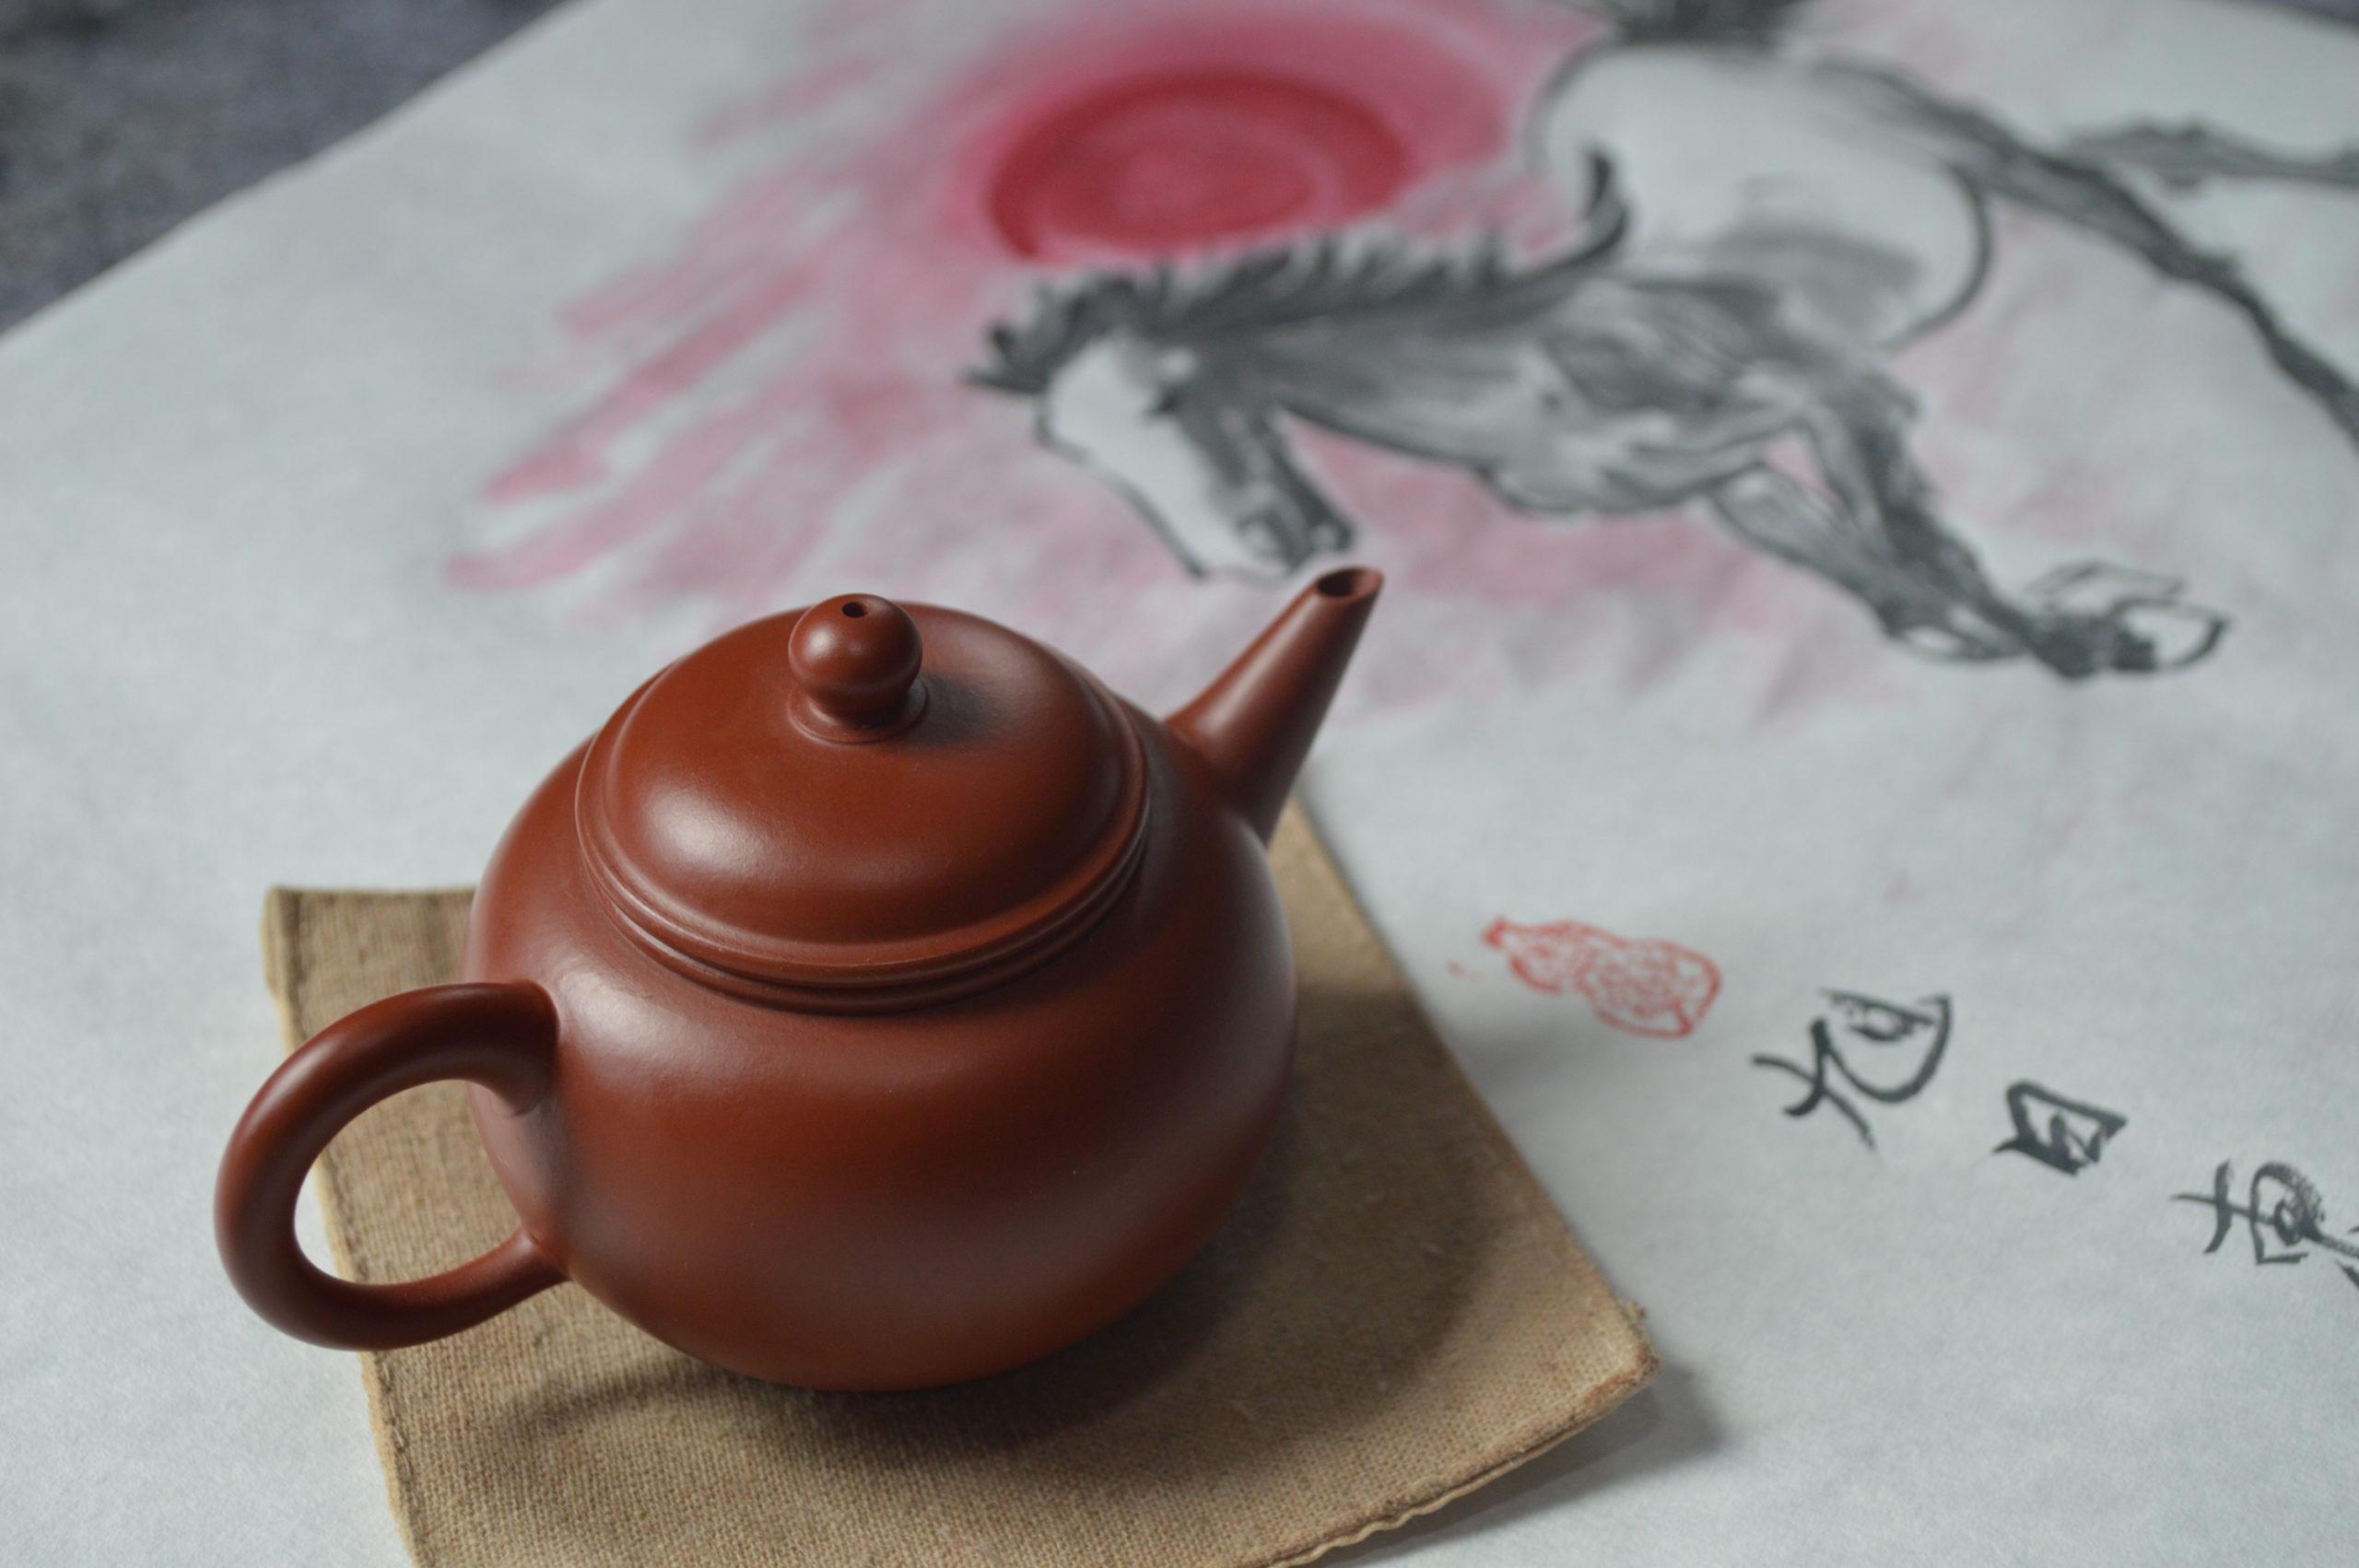 https://shop.liu-tea-art.com/wp-content/uploads/2019/07/DSC_0122-scaled.jpg